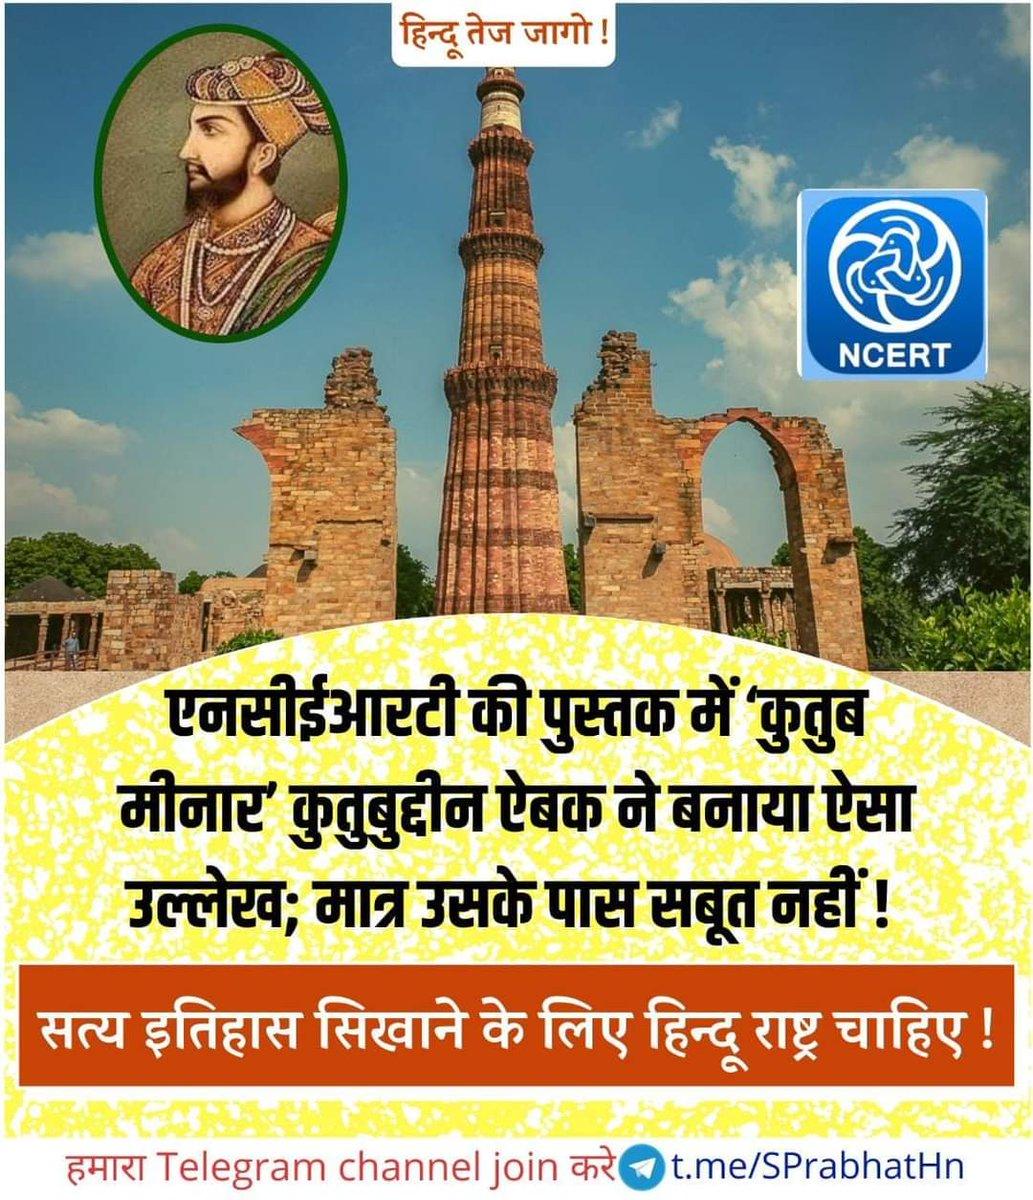 🚩 Hindu Tej Jago 🚩  #NCERT book claims 'Qutub Minar' was built by Qutubuddin Aibak, which has no substantial evidences to prove !    👉 True History will be taught in #HinduRashtra !     #thursdayvibes #ThursdayThoughts